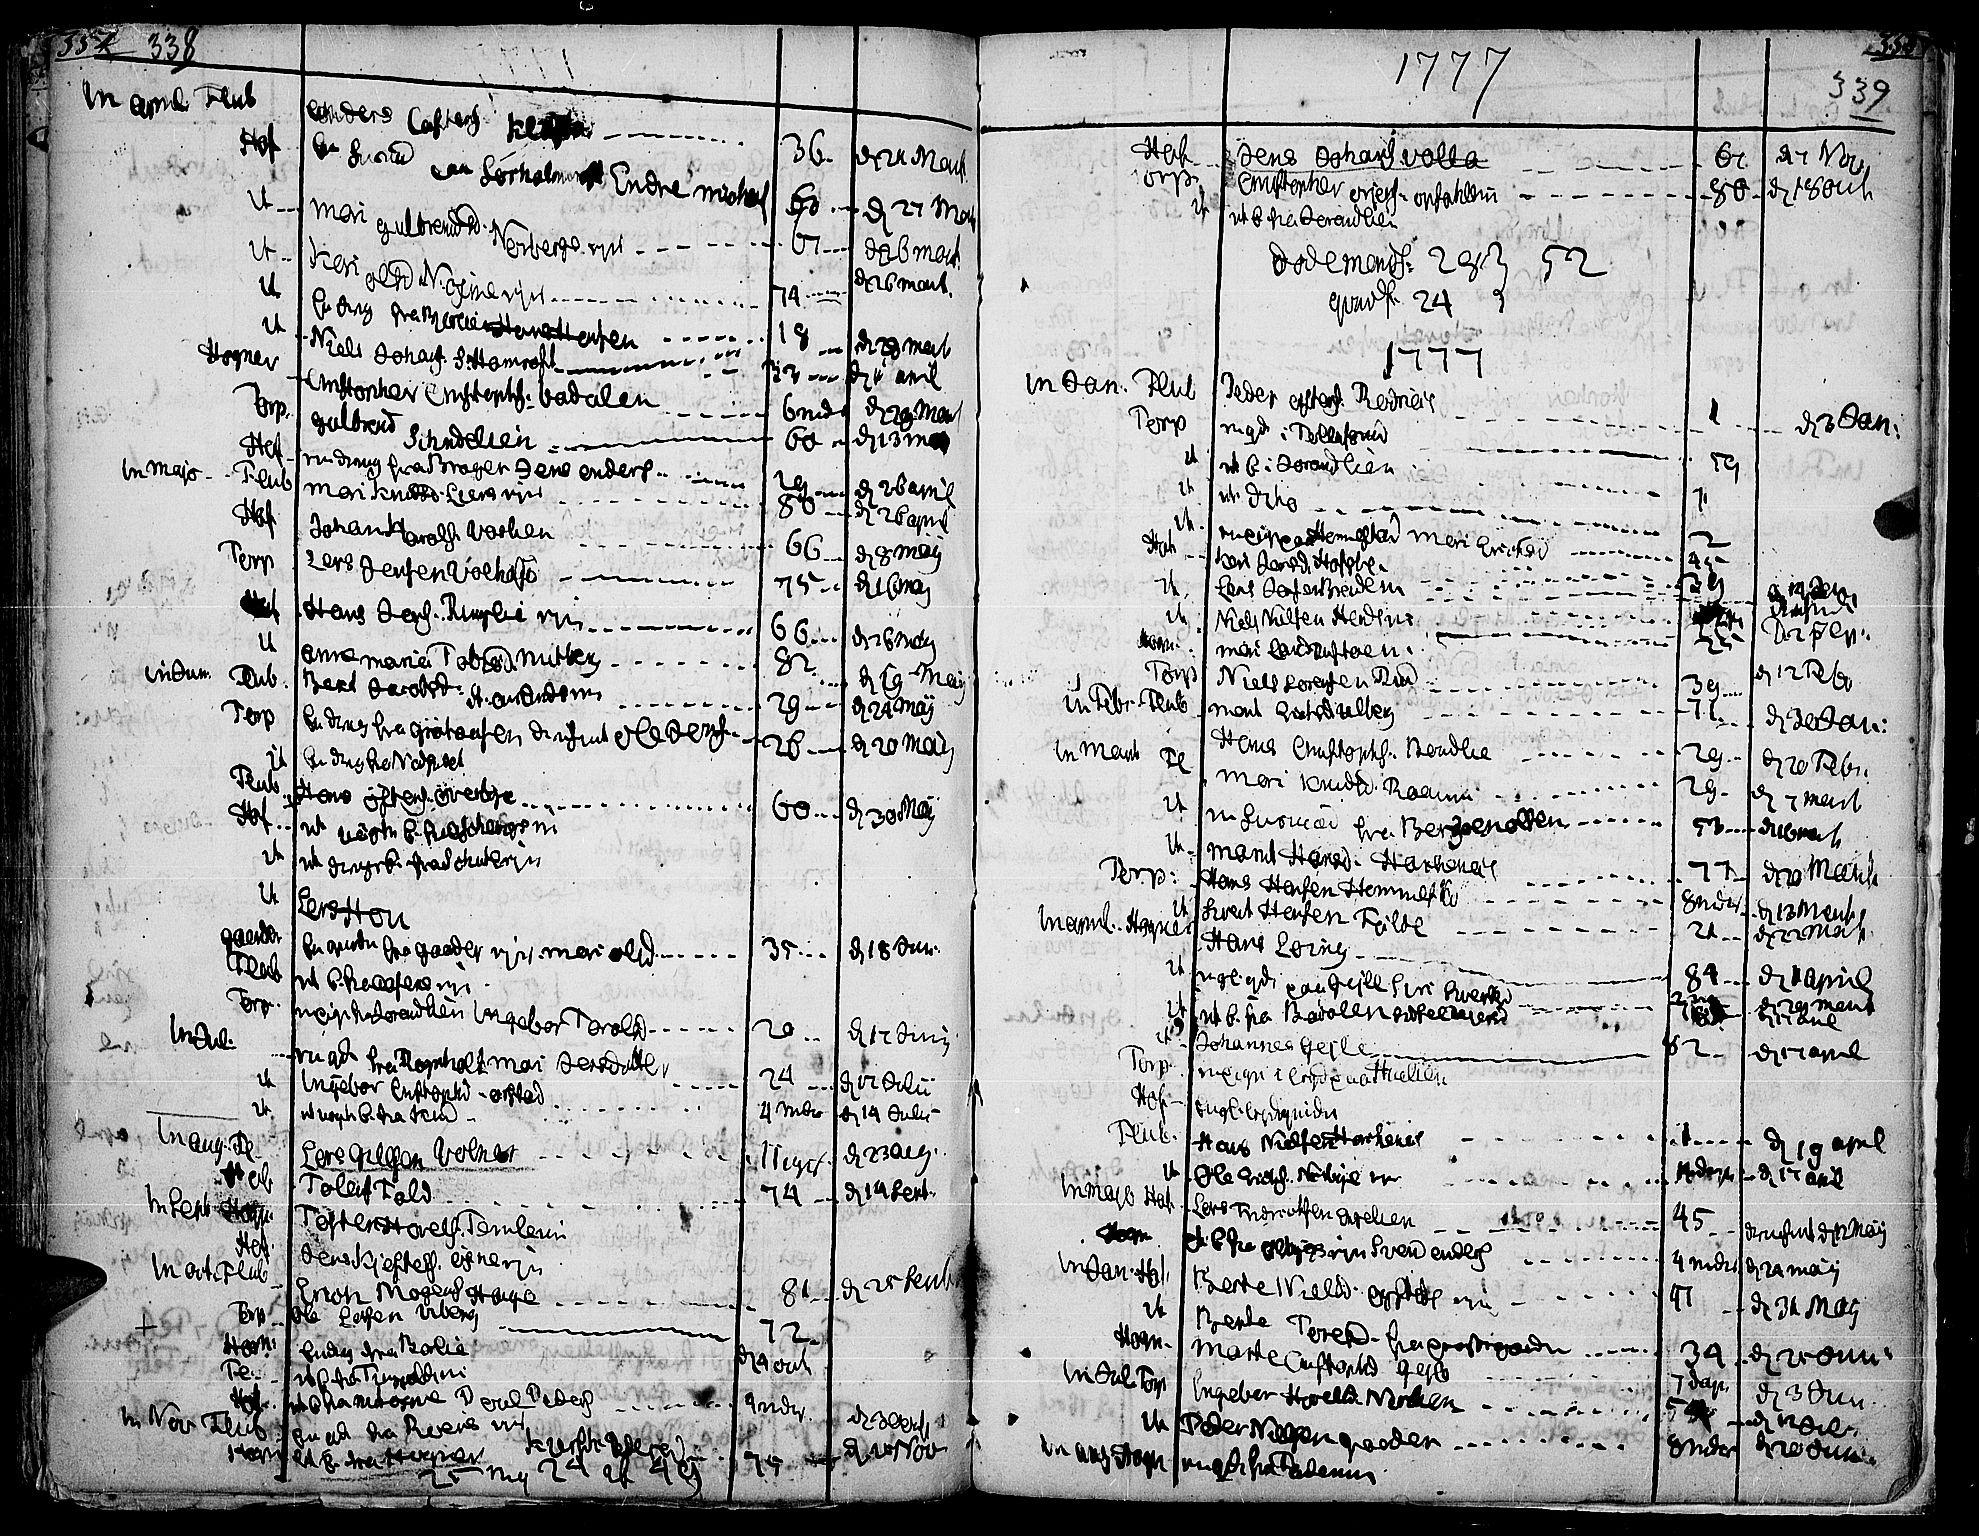 SAH, Land prestekontor, Ministerialbok nr. 5, 1765-1784, s. 338-339